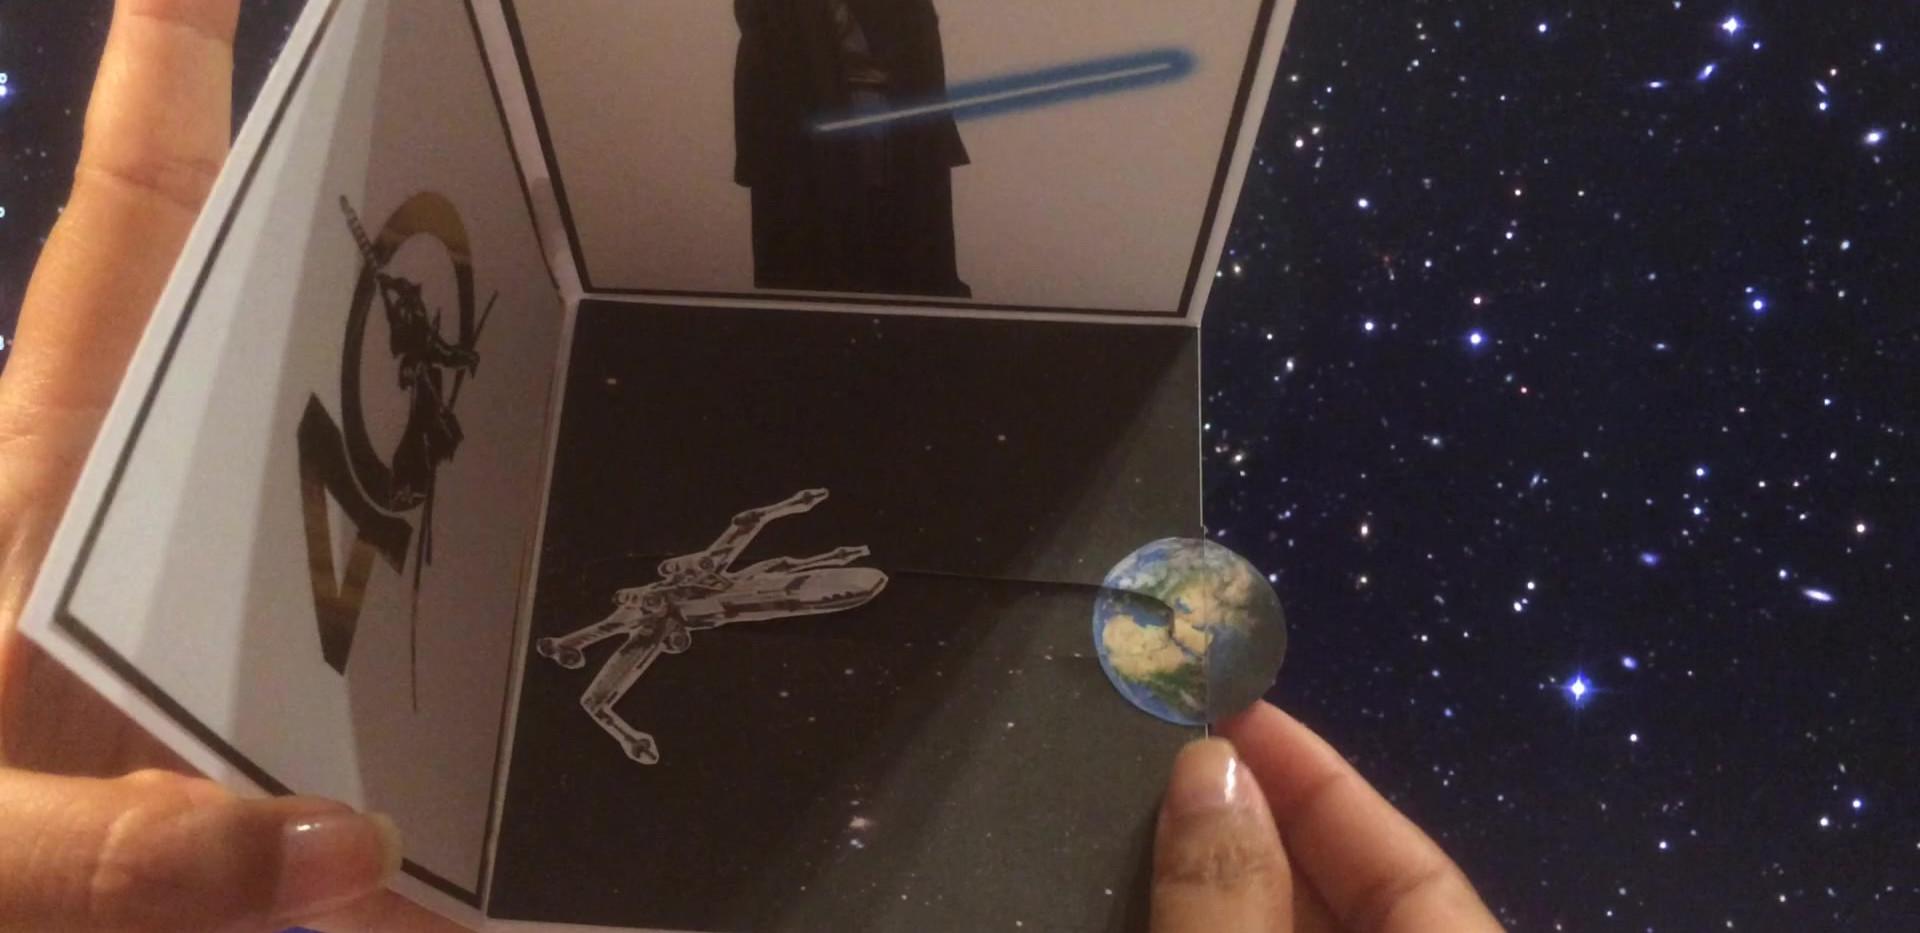 carte pop up Star Wars à tirette